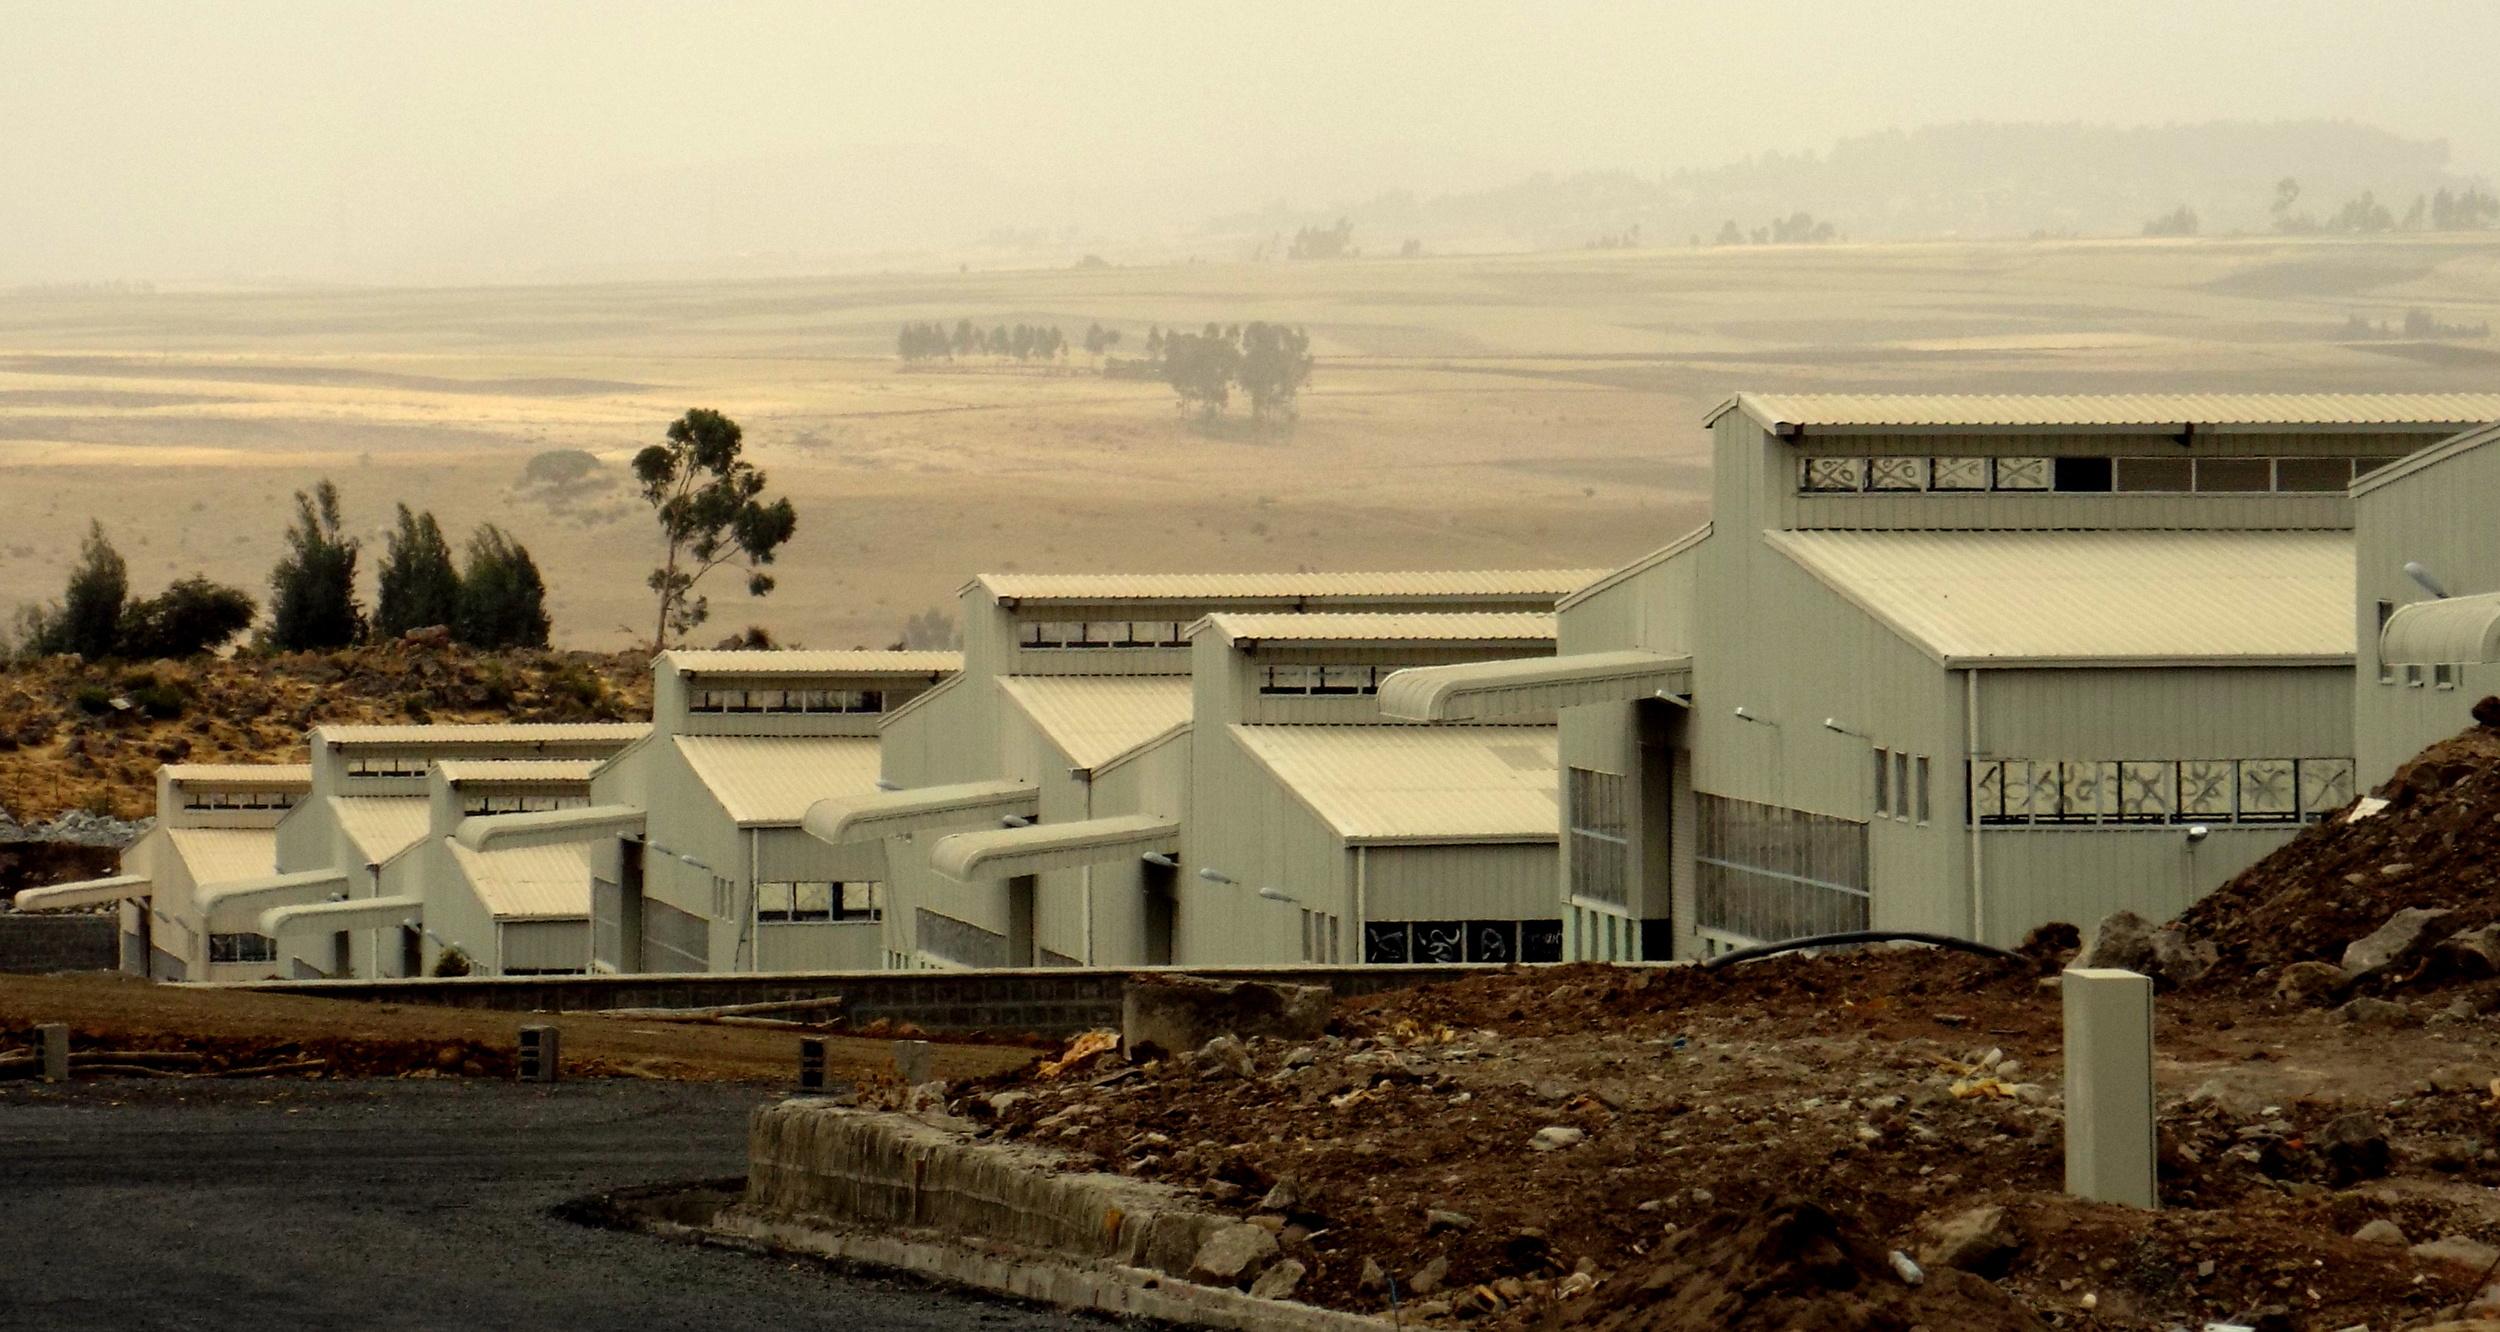 Bole-Lemi Industrial Park, Ethiopia